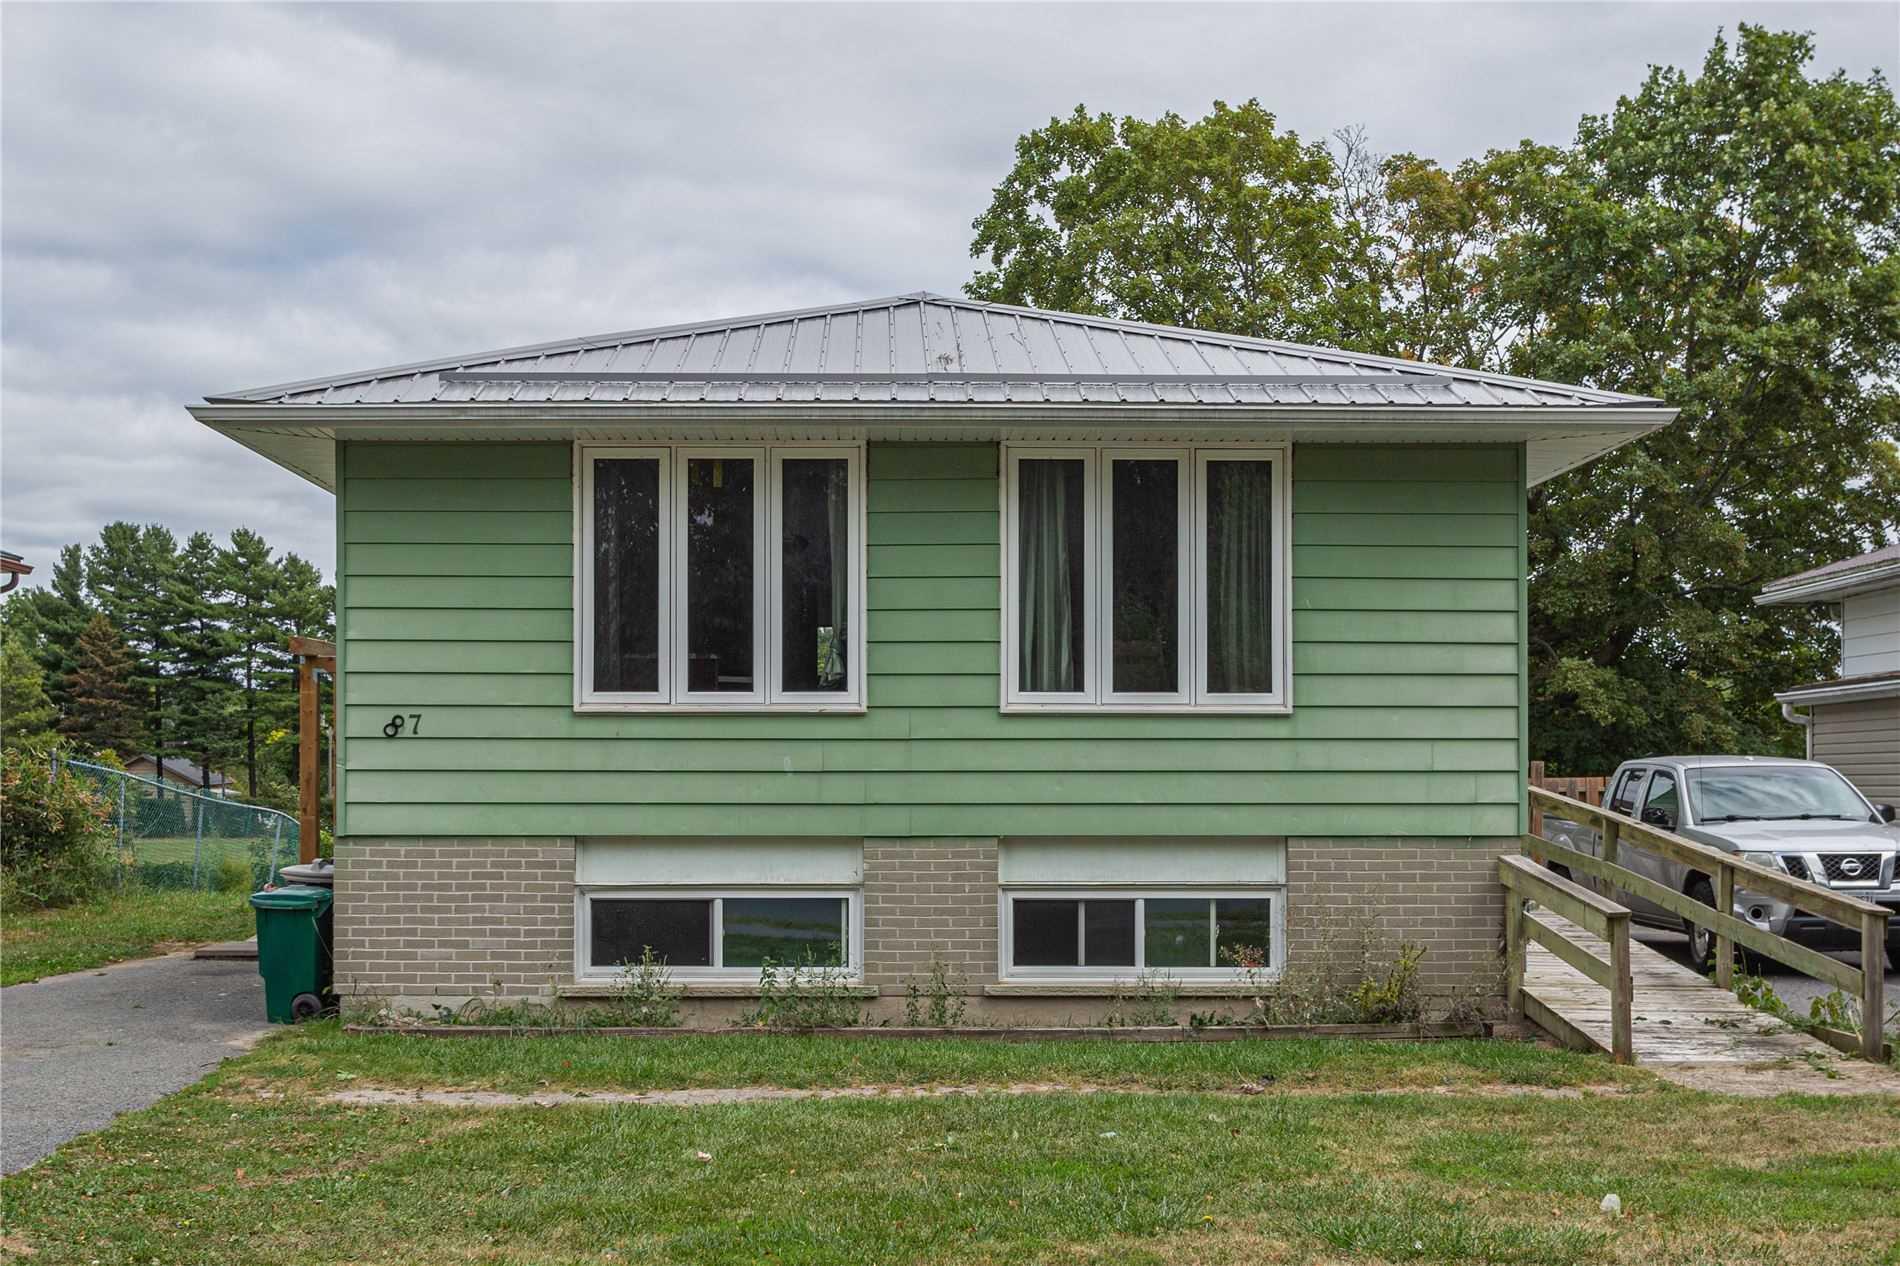 87 Calderwood Dr, Kingston, Ontario K7M 6L5, 3 Bedrooms Bedrooms, ,2 BathroomsBathrooms,Detached,For Sale,Calderwood,X5368835